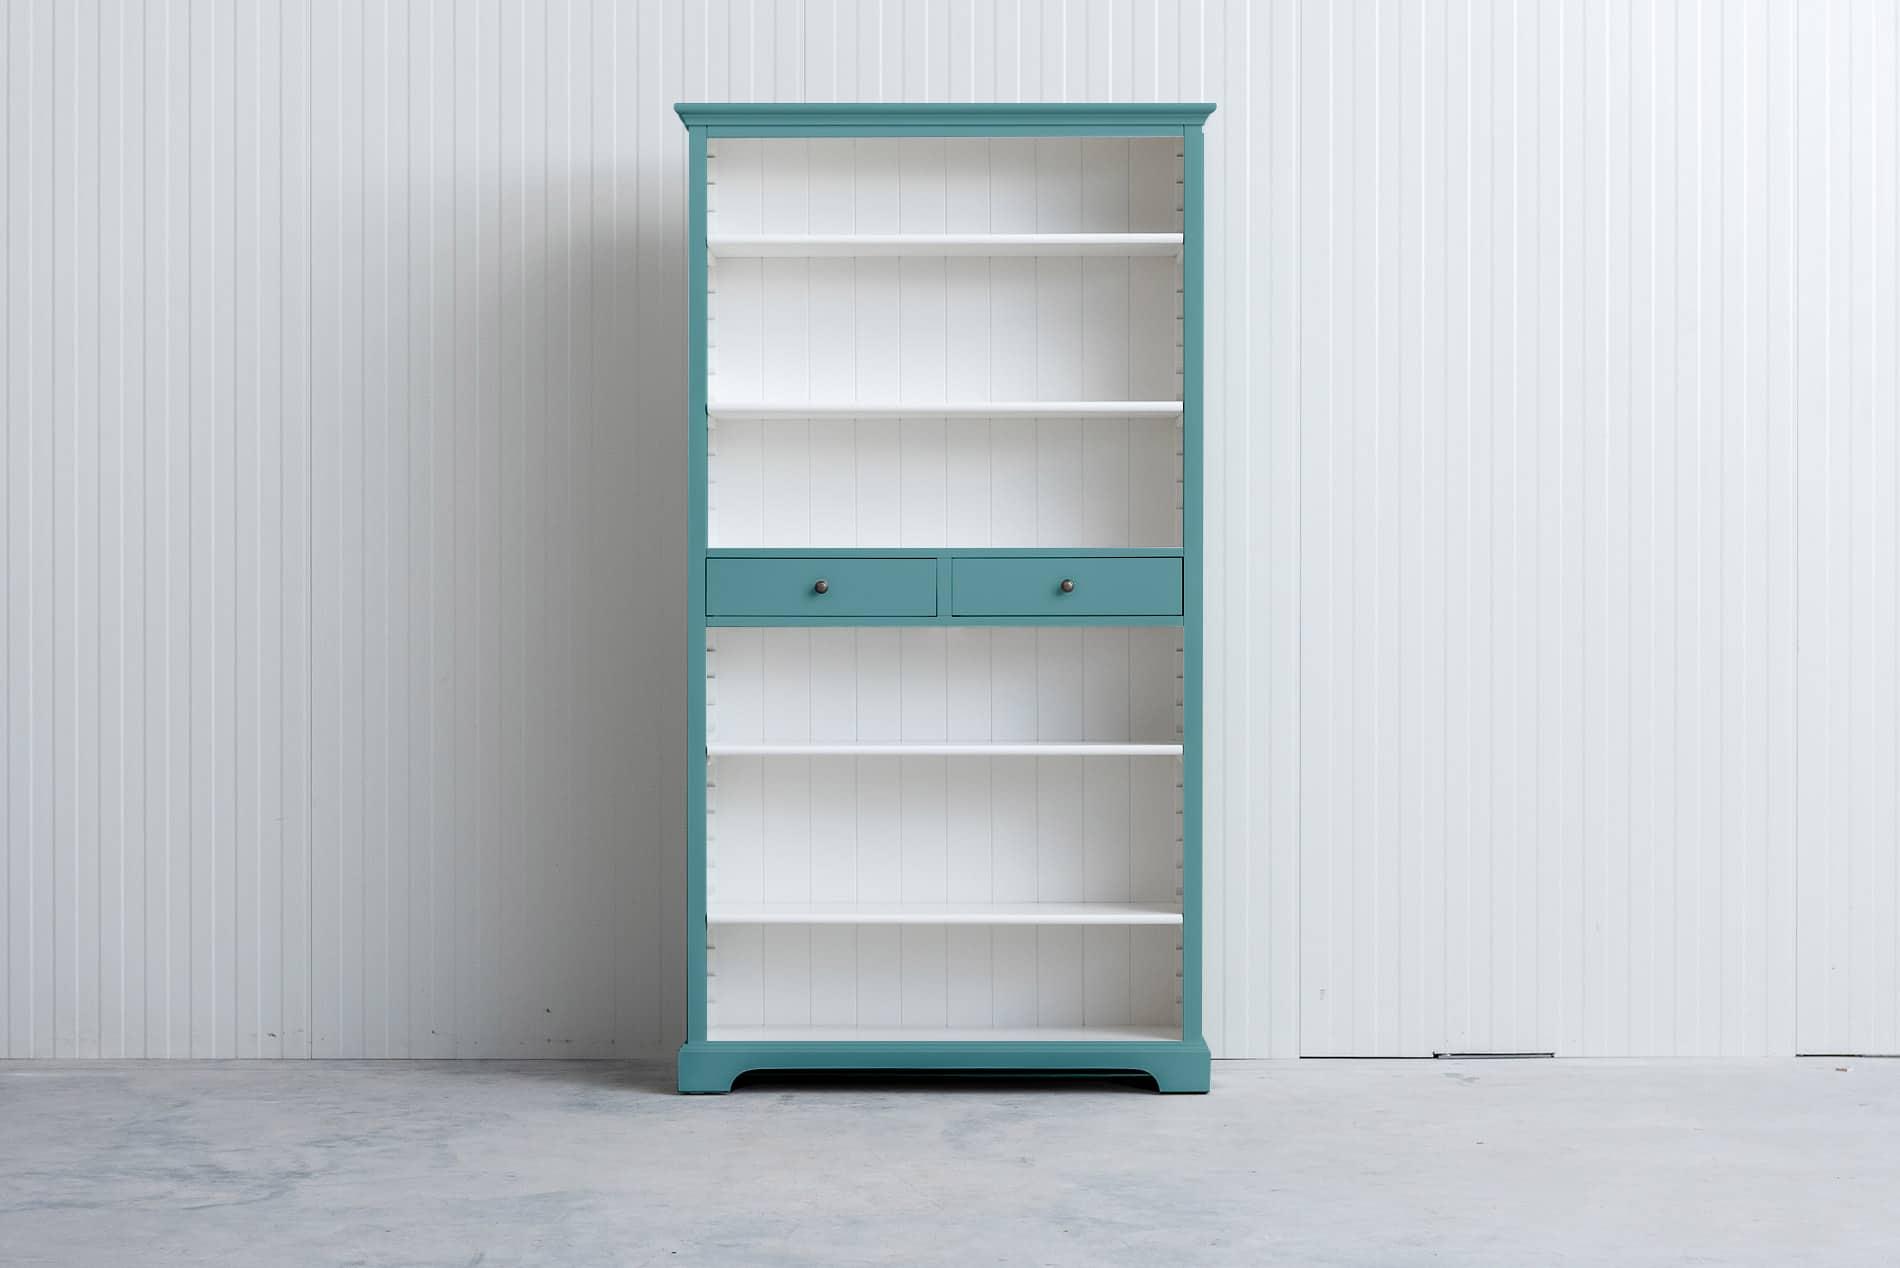 Landelijke boekenkast 1m – Pastelturquoise – RAL6034